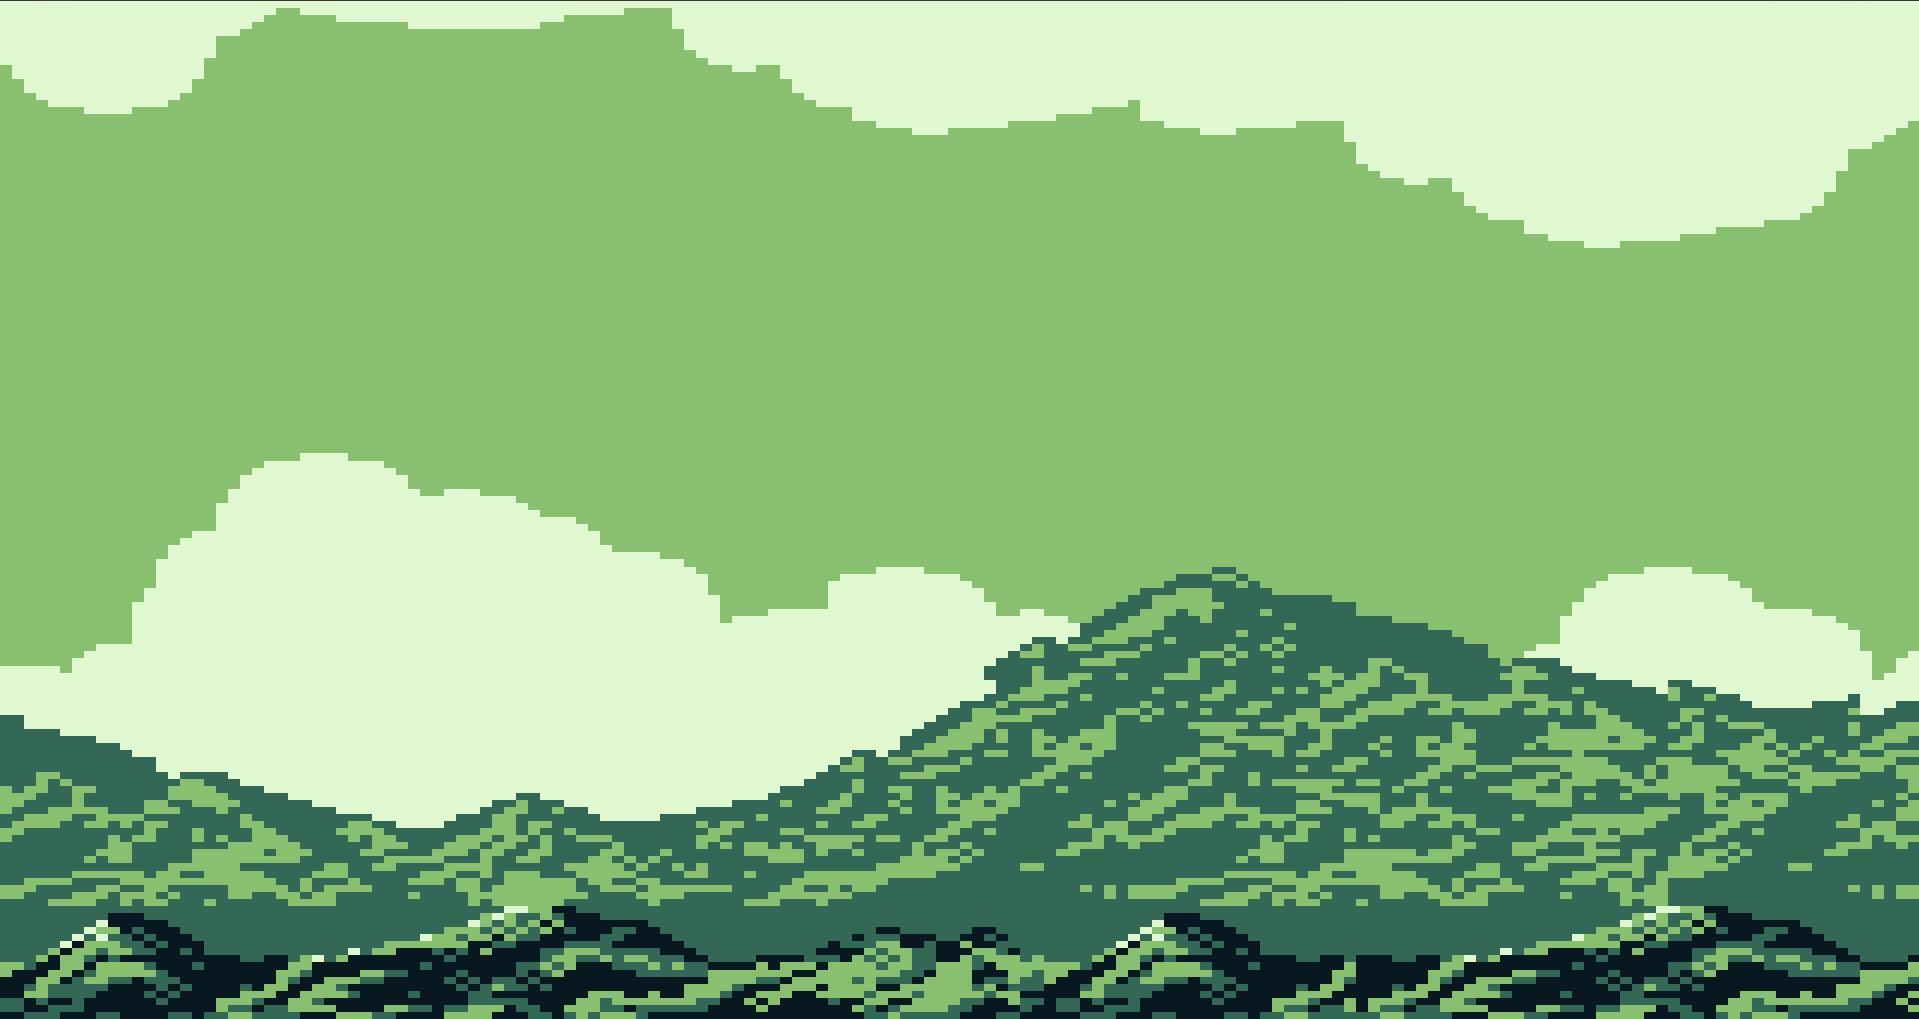 Fond Décran Forêt Illustration Pixel Art Herbe Vert